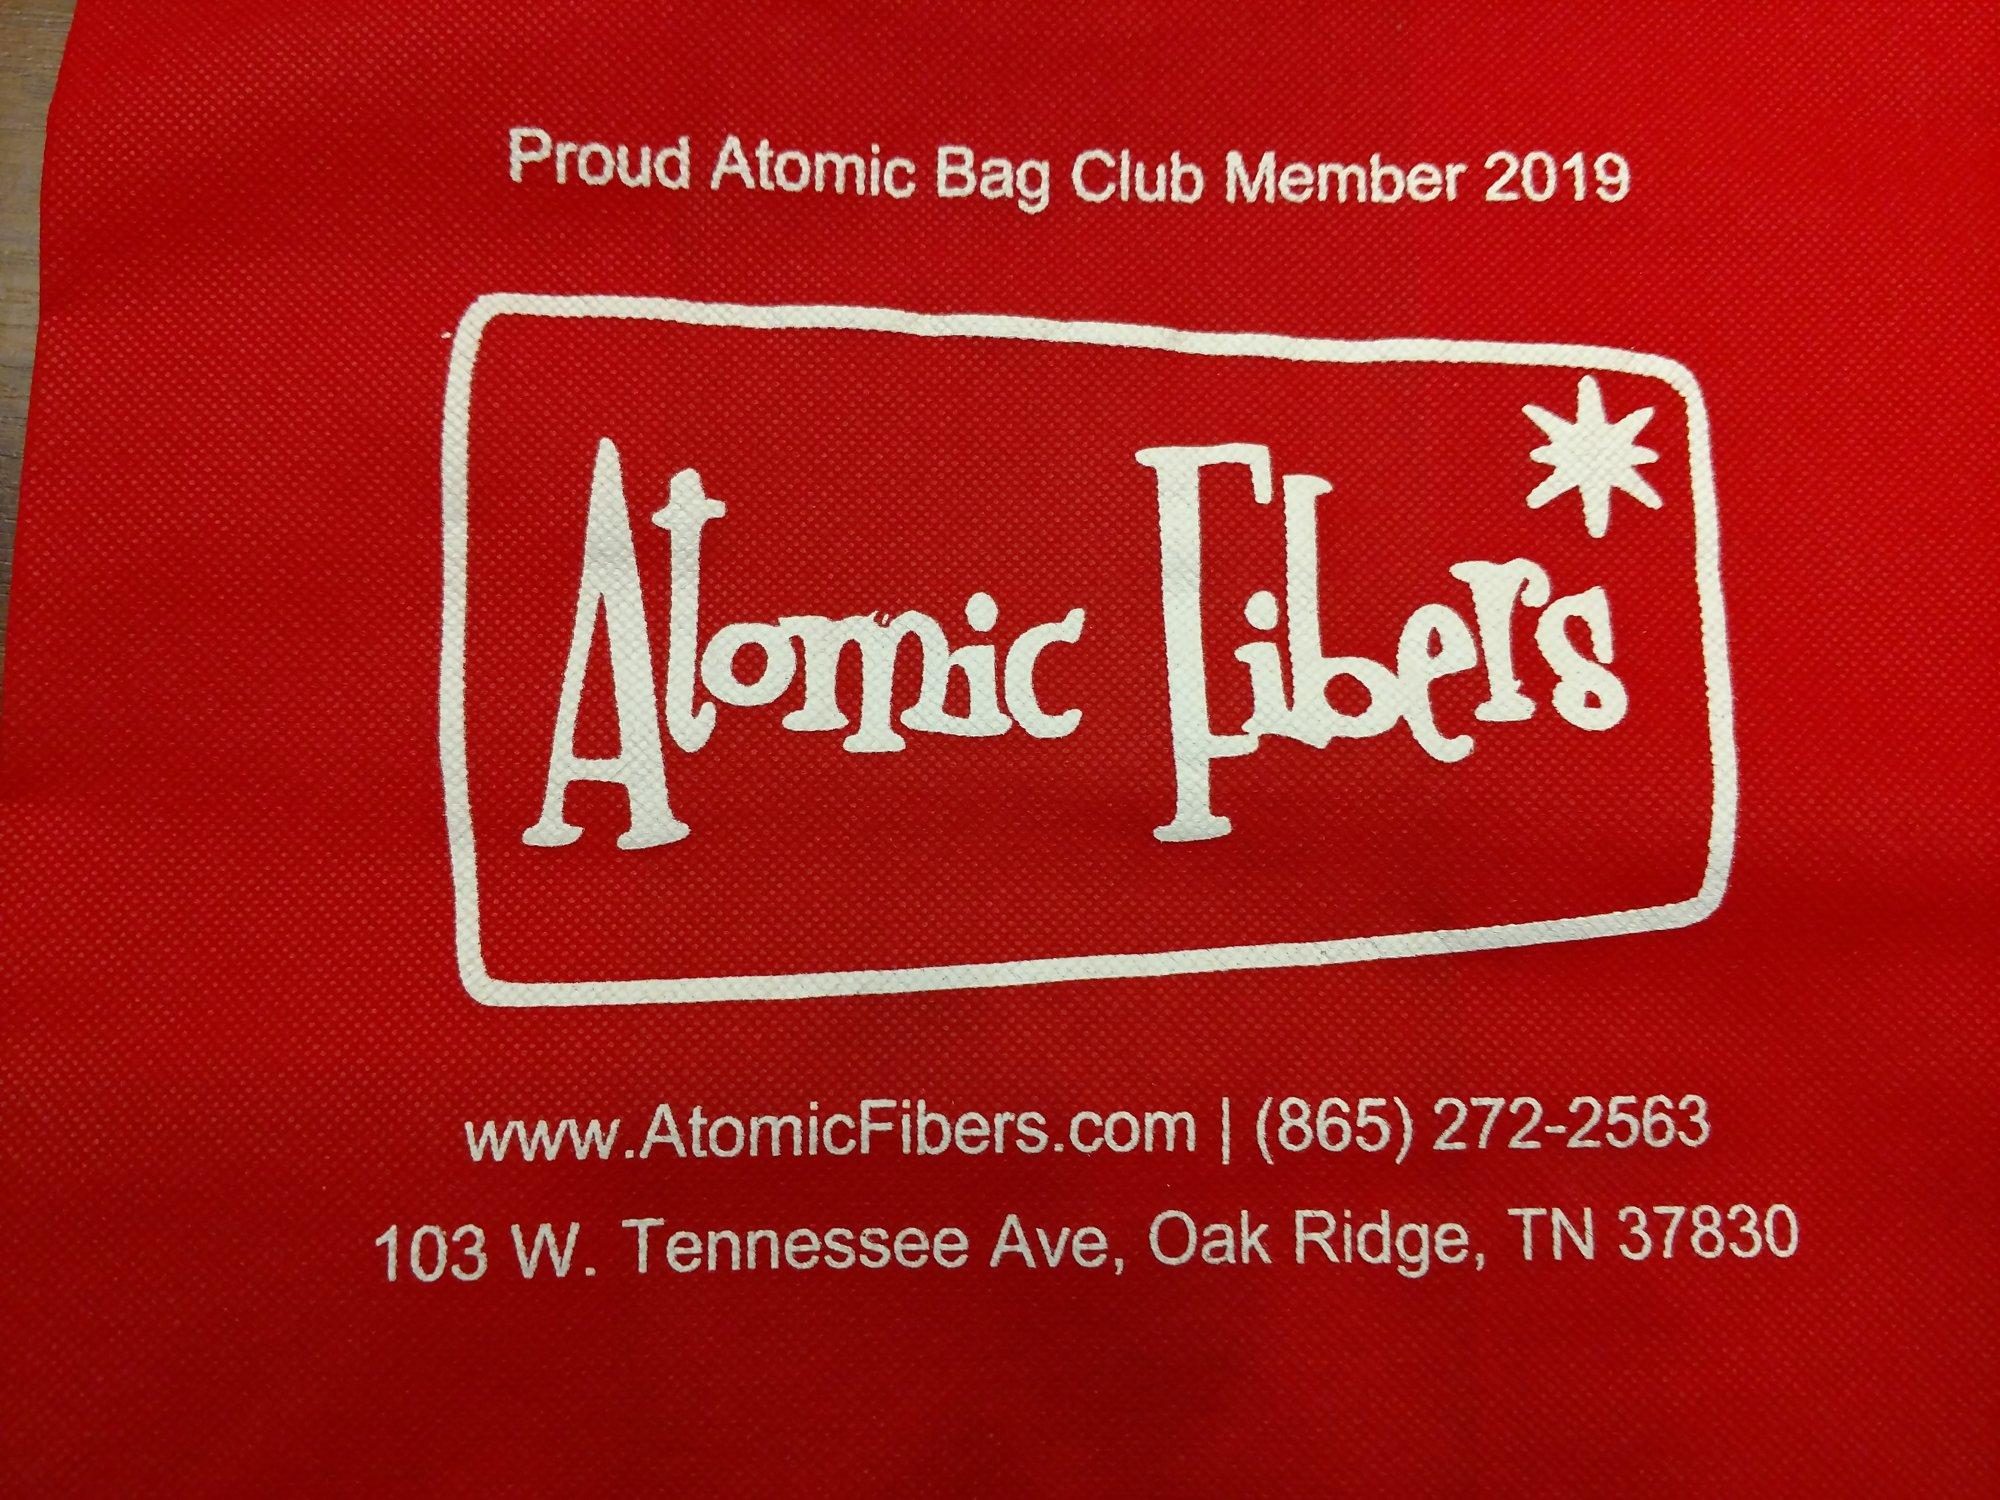 2019 Atomic Bag Club Bag